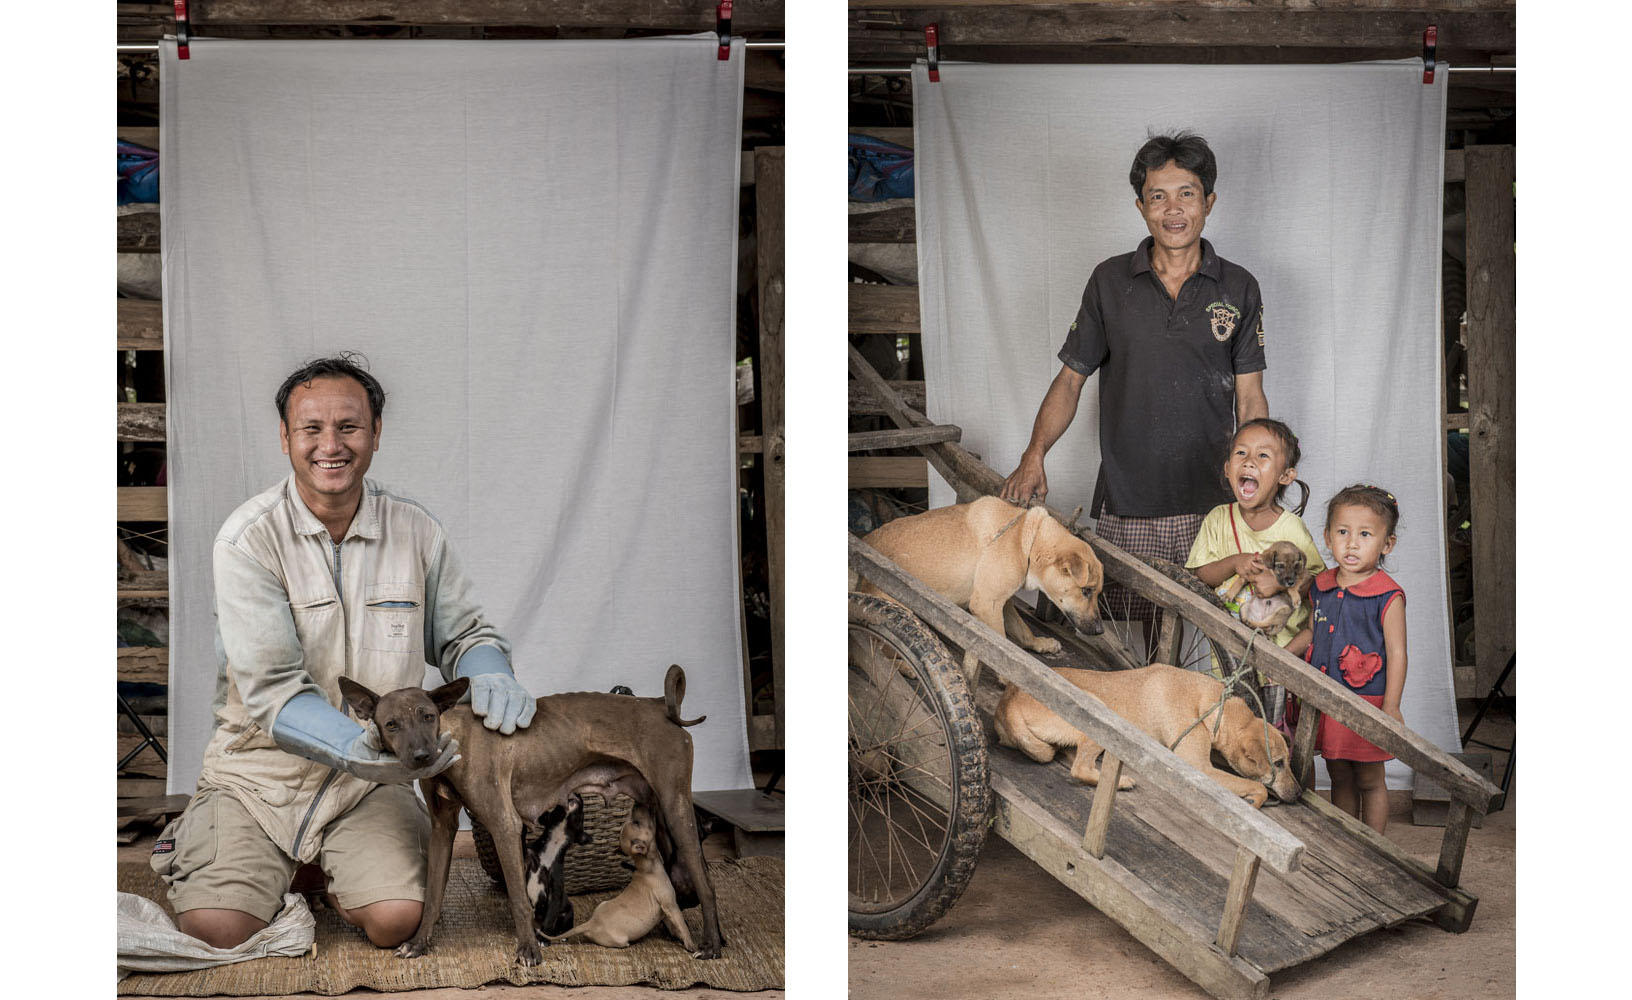 2012_012_TabCo_VWB_Laos_ERN_6812